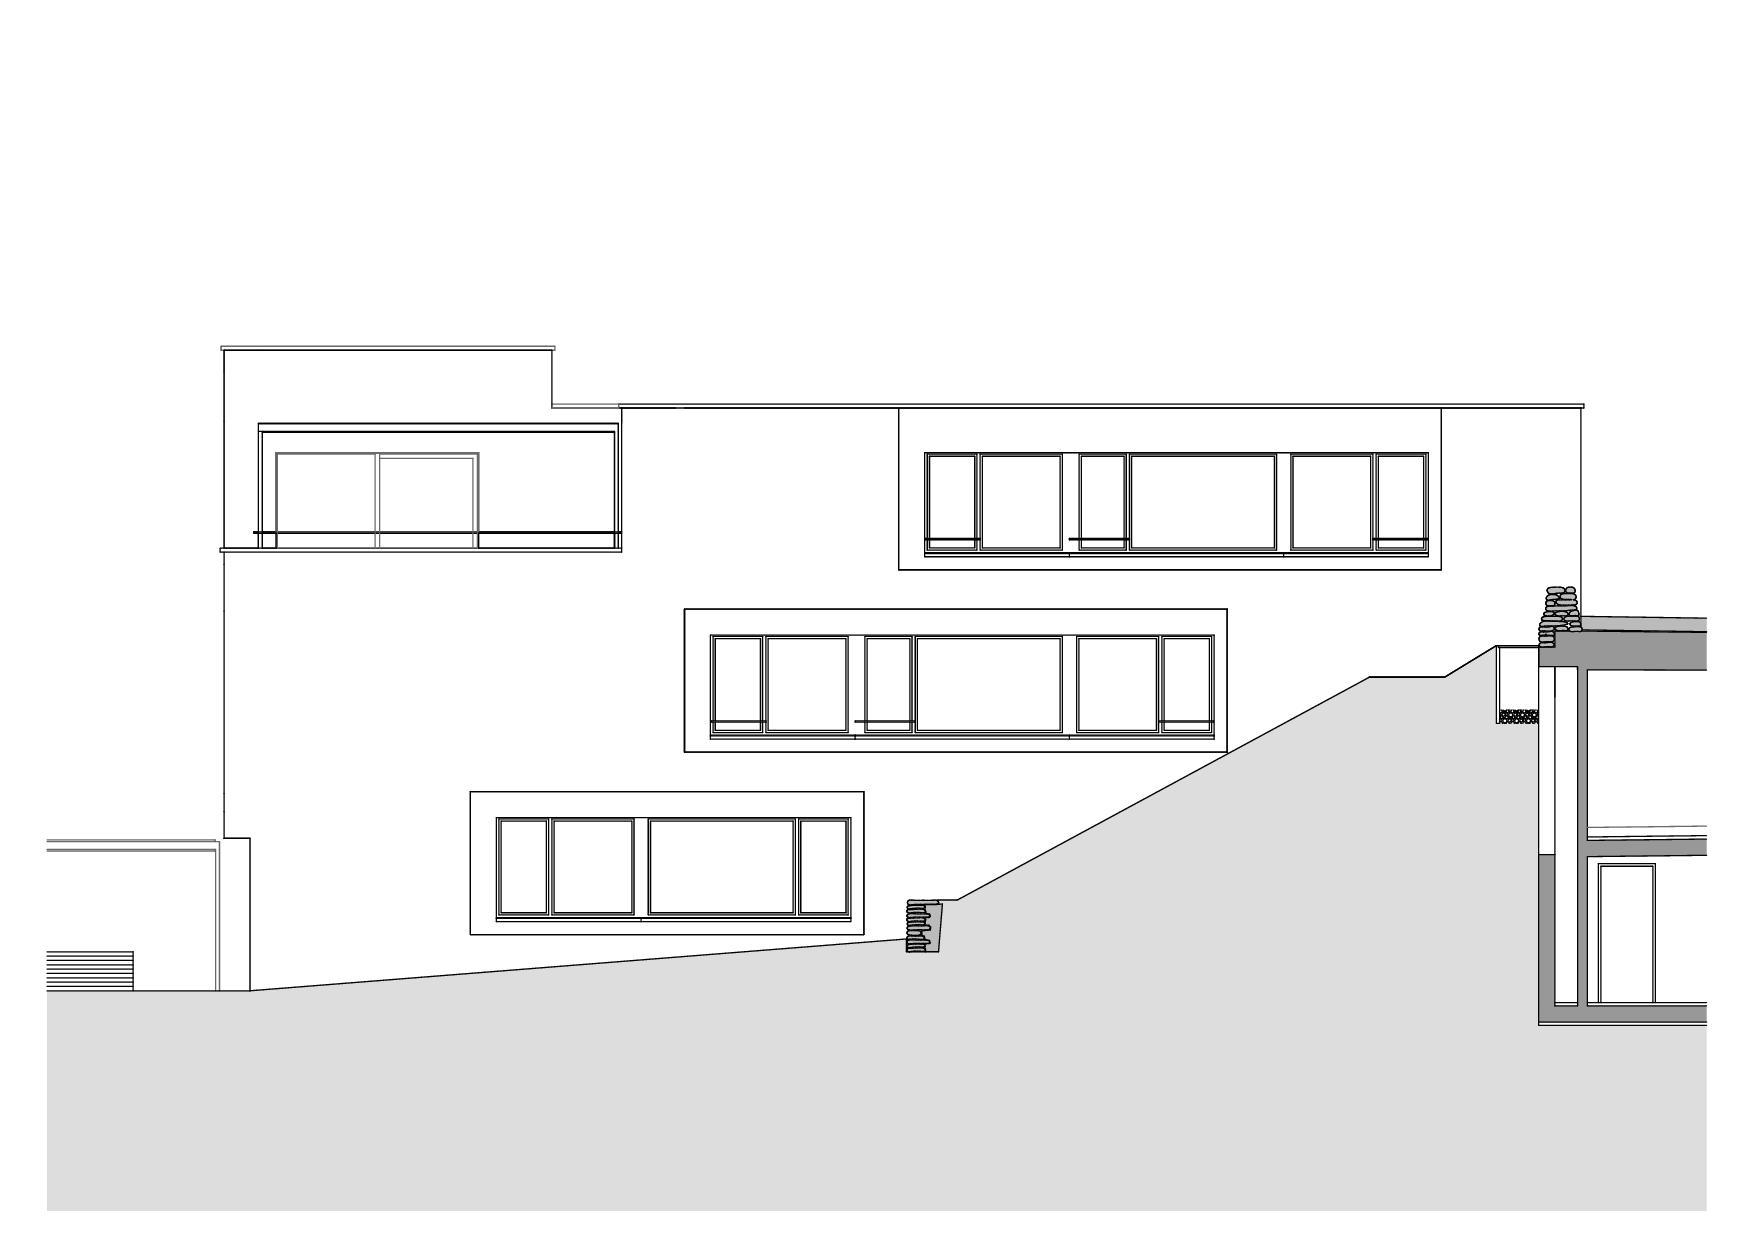 Haus B Ostfassade-001.jpg